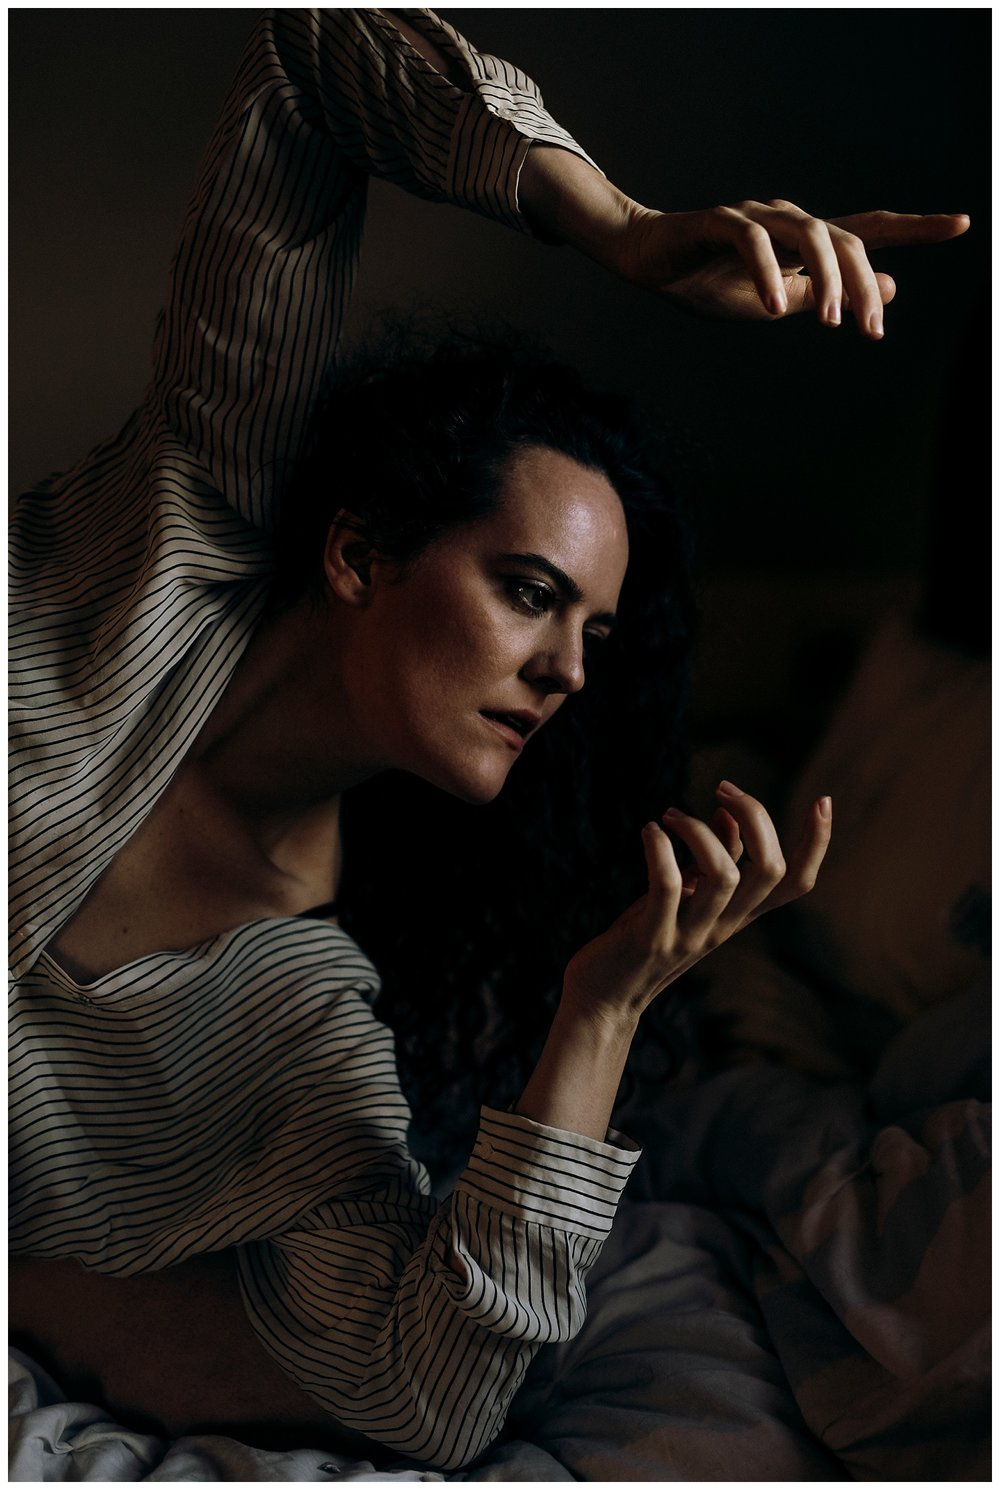 Dancer_Portraits_NYC_Drama_Headshots_Theatre_Photography_Apollo_Fields_08.jpg